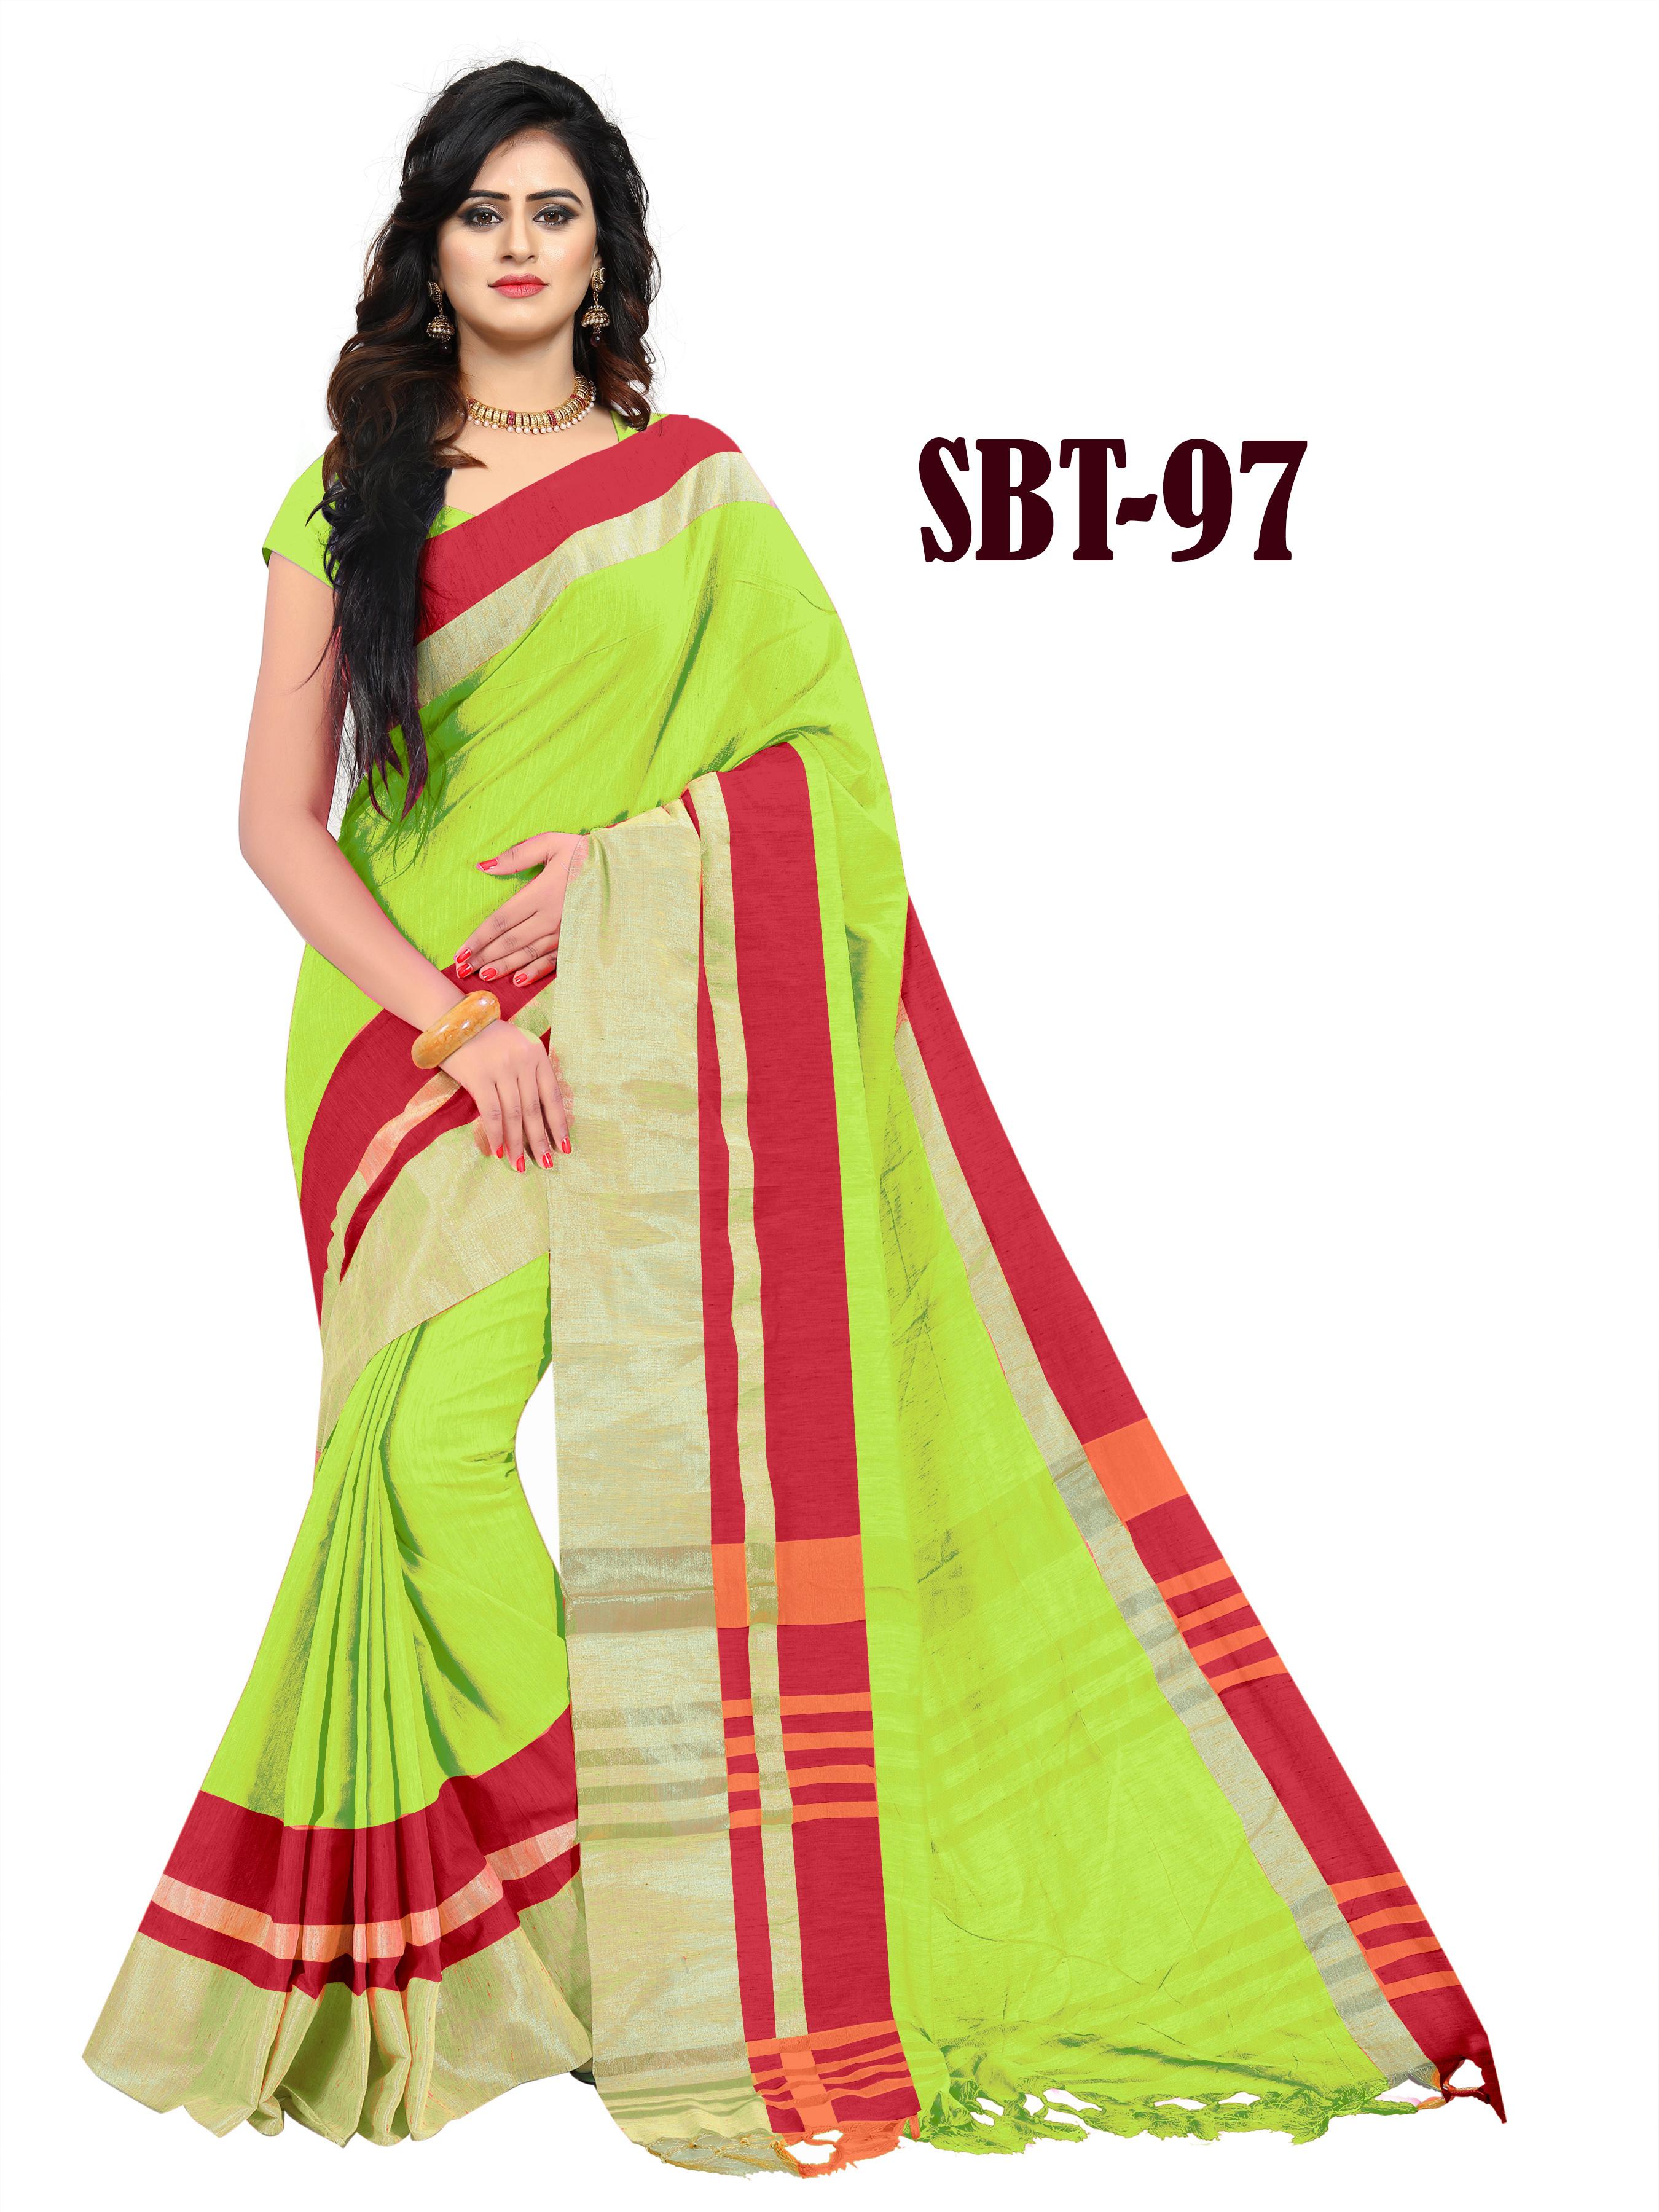 New Woman Silk Saree